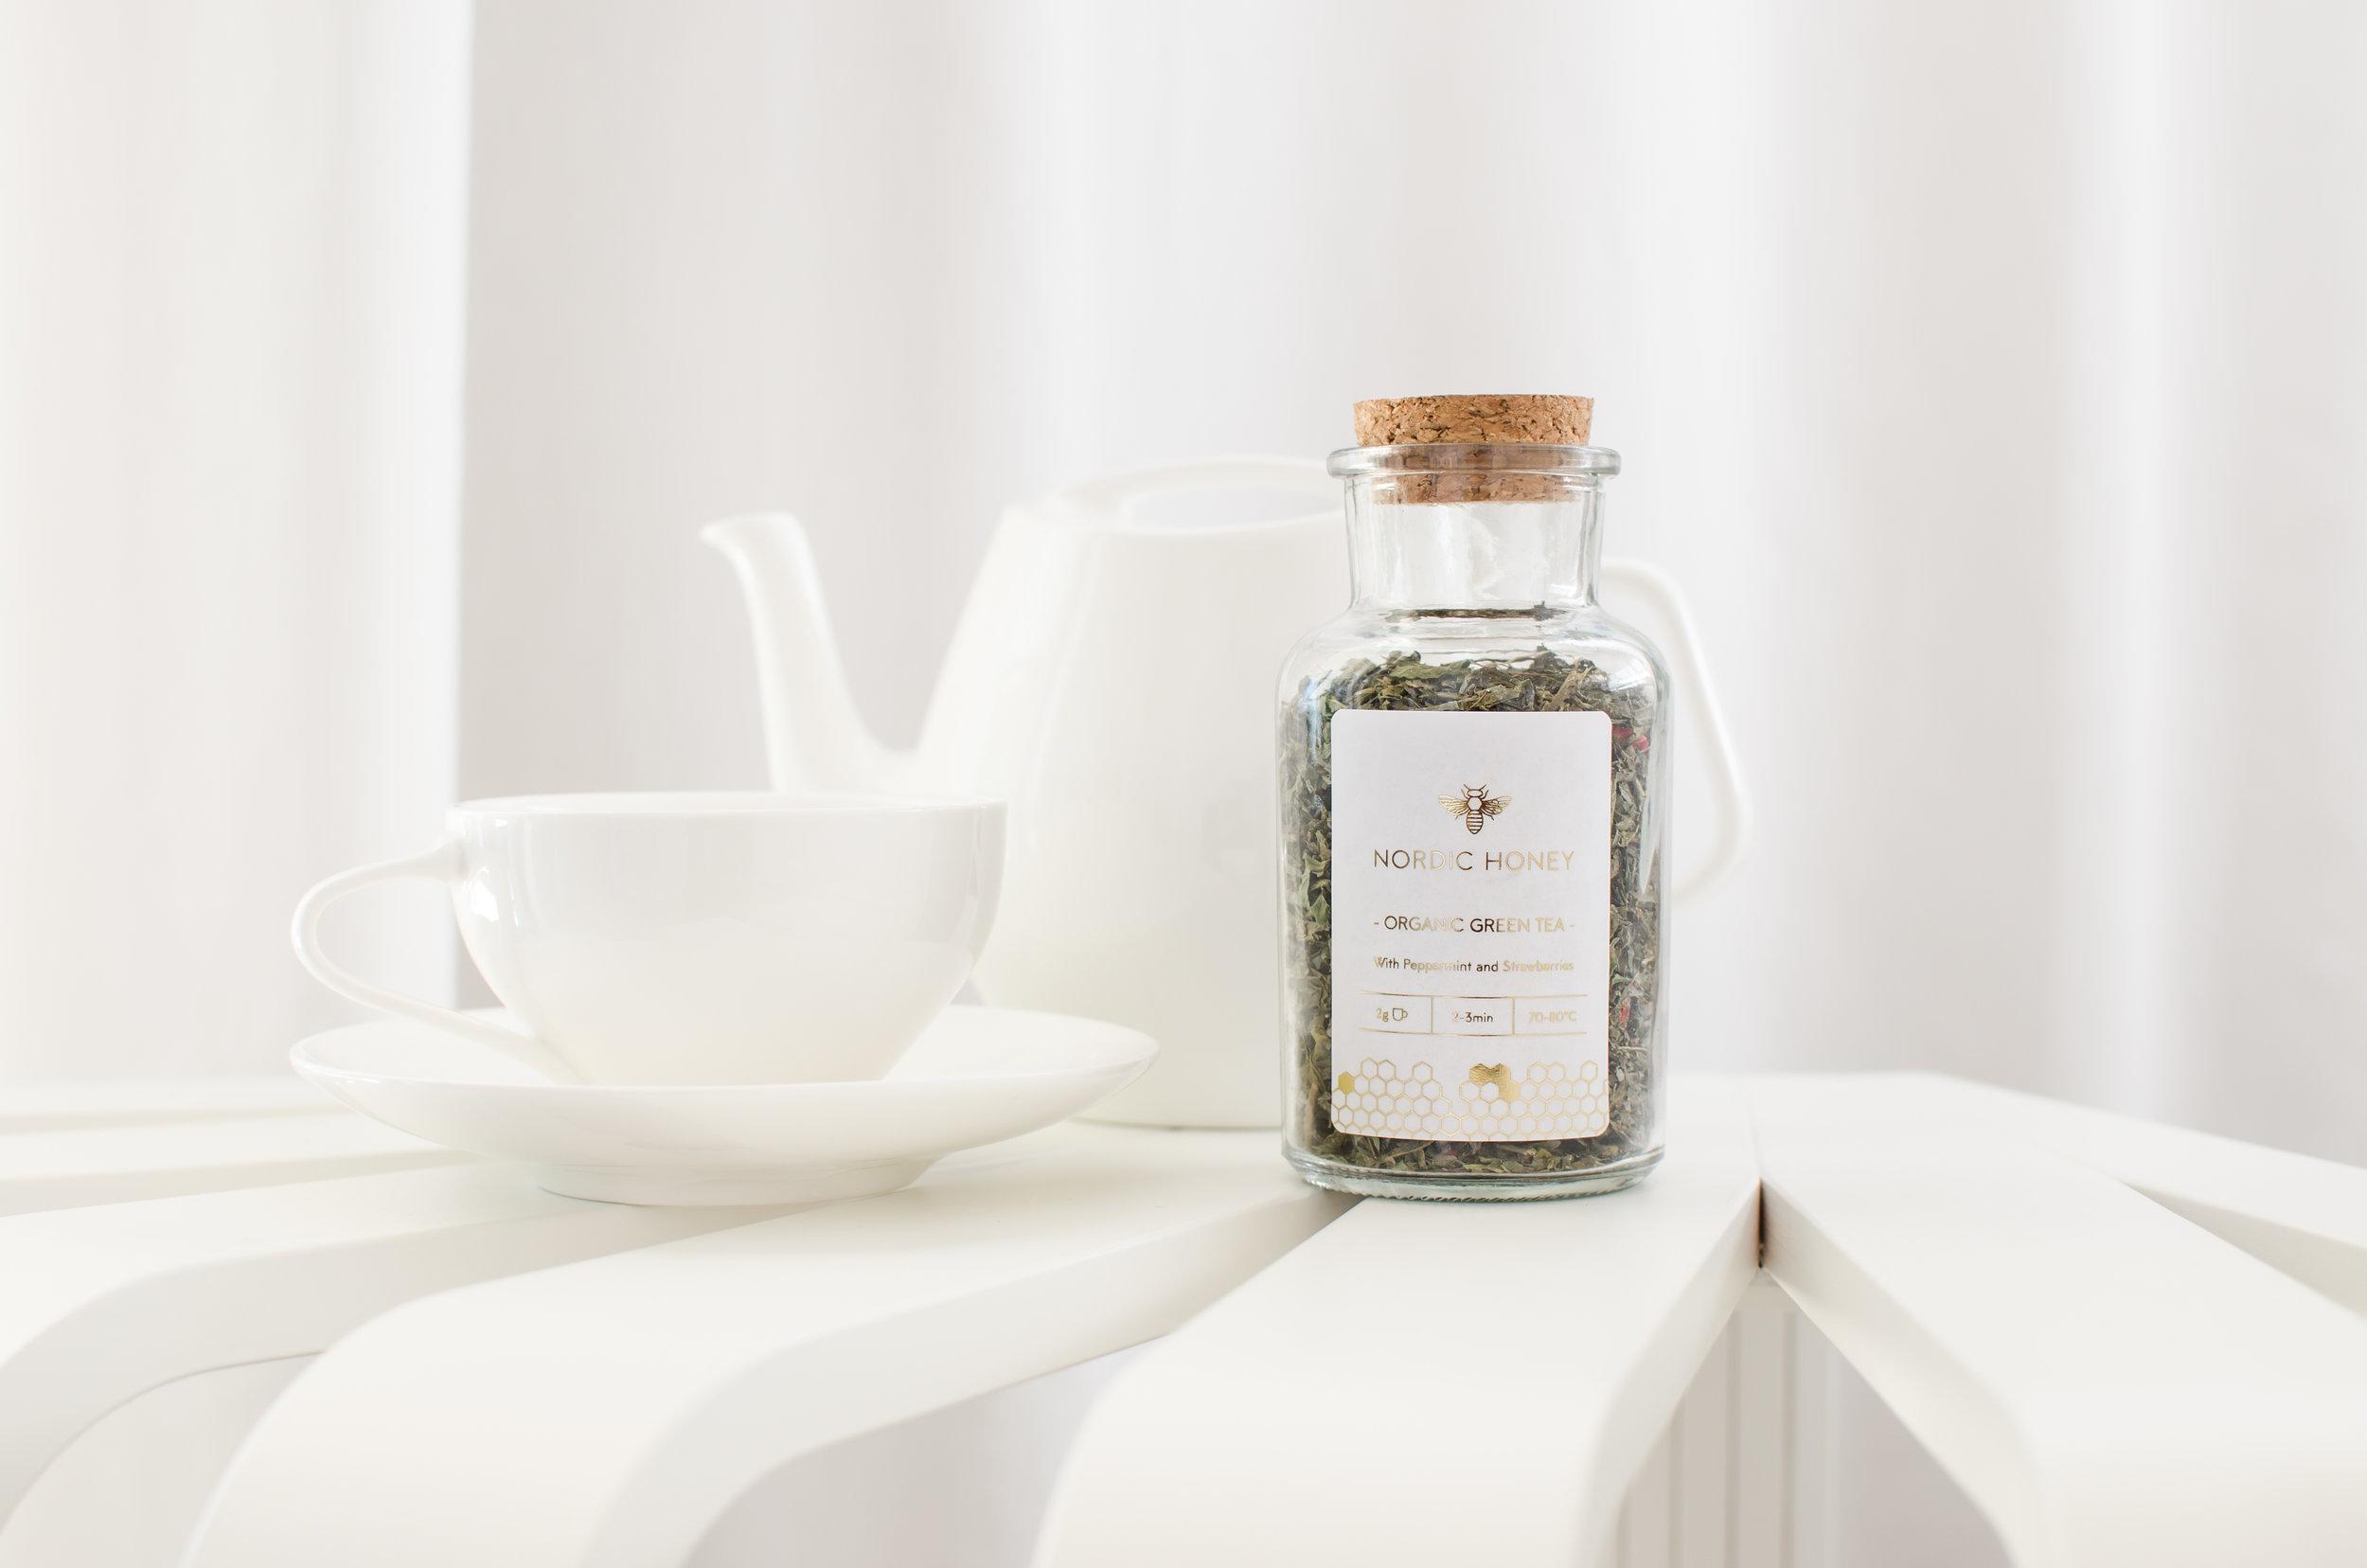 Nordic Honey_Health Benefits of Green tea_Green Tea with Peppermint & Strawberries_jar with cork.jpg